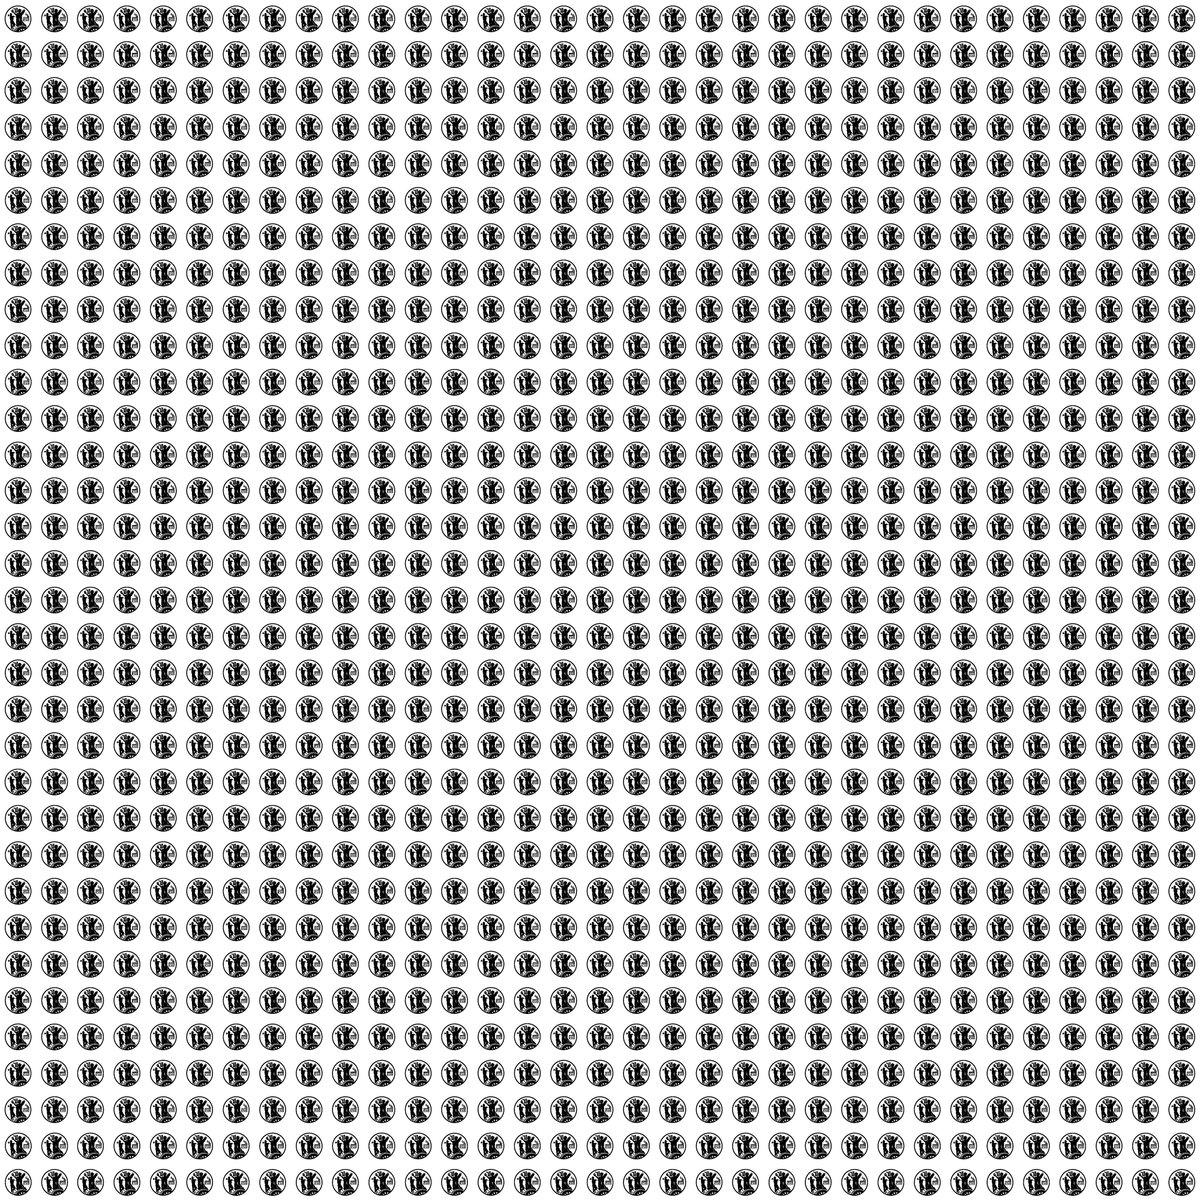 Acid sheet.jpg